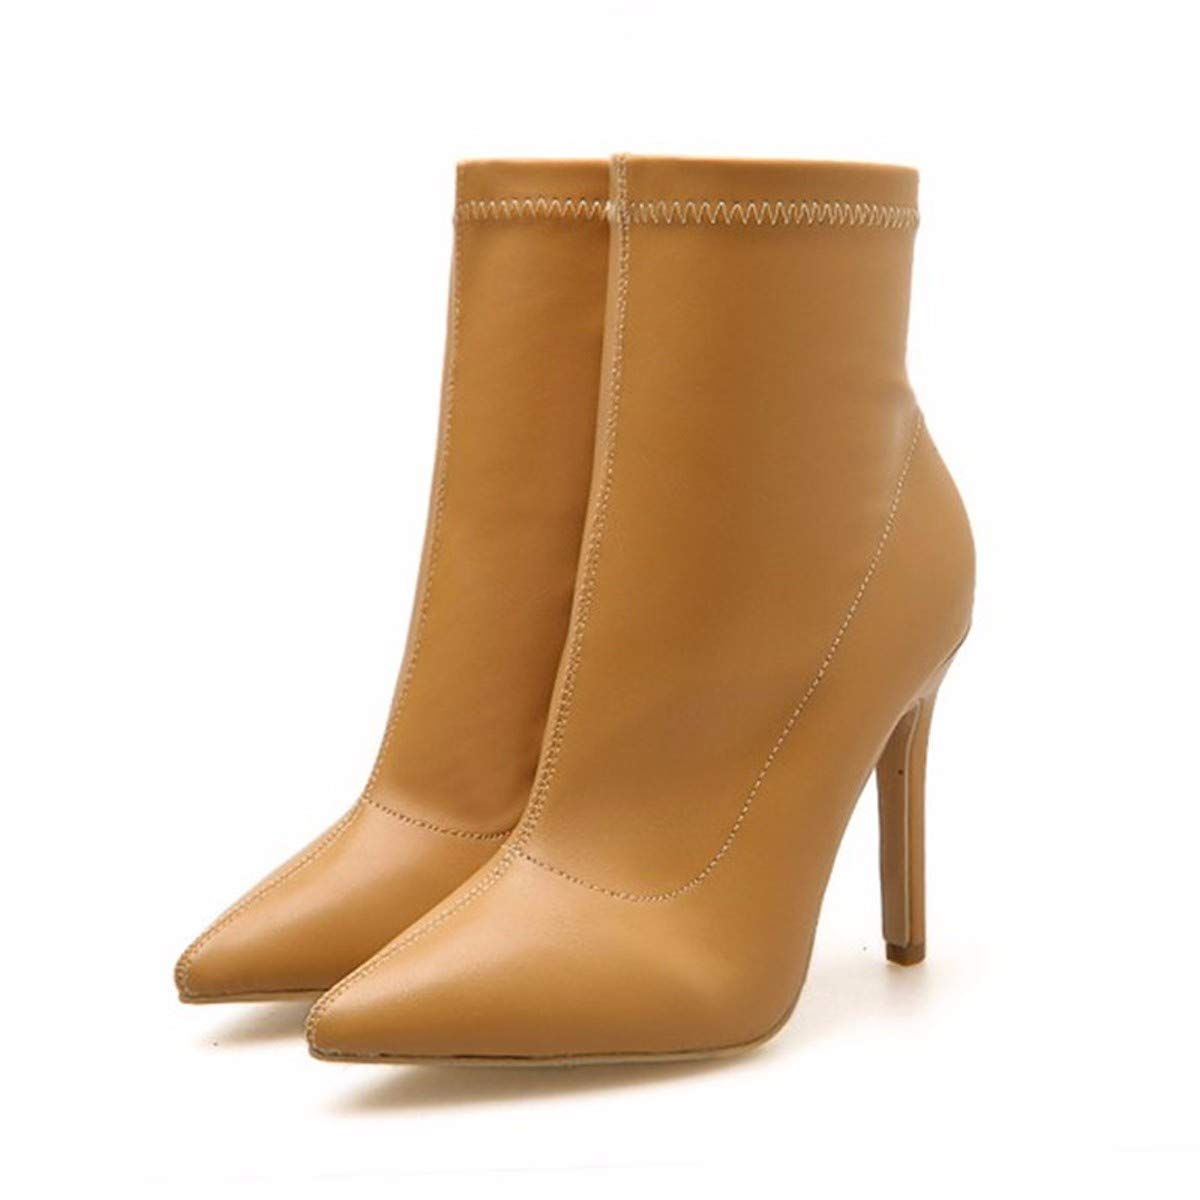 LBTSQ-Mode Damenschuhe Temperament Kurze Stiefel High 10Cm 10Cm 10Cm Seite Reißverschluss Dünne Sohle Martin Stiefel Spitzer Kopf Nackt Stiefel. 3d2662